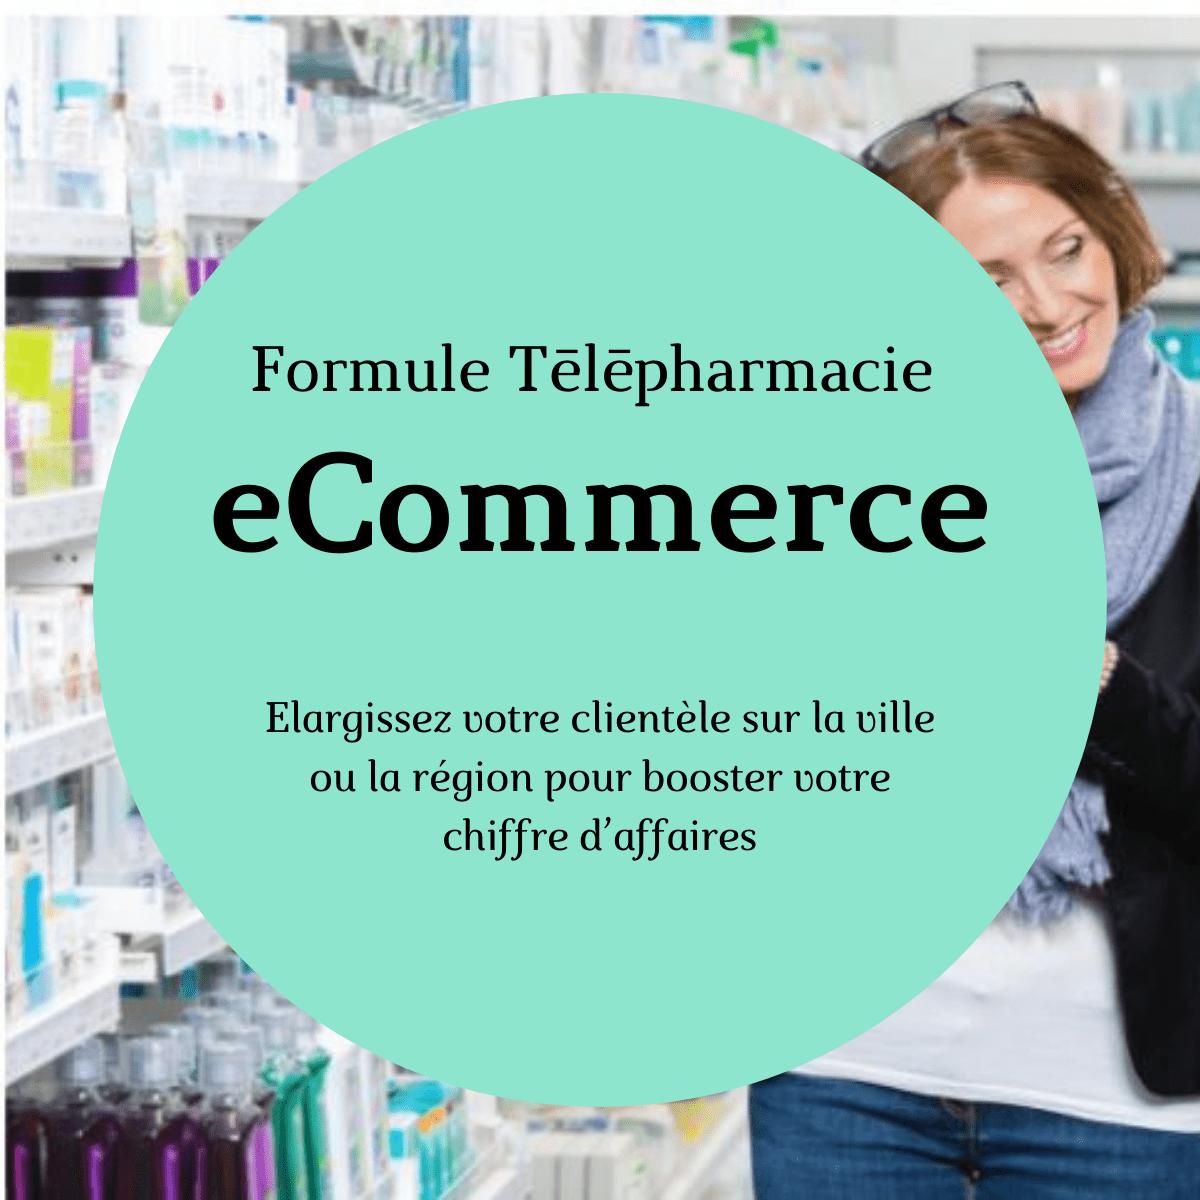 Formule vente en ligne pharmacie